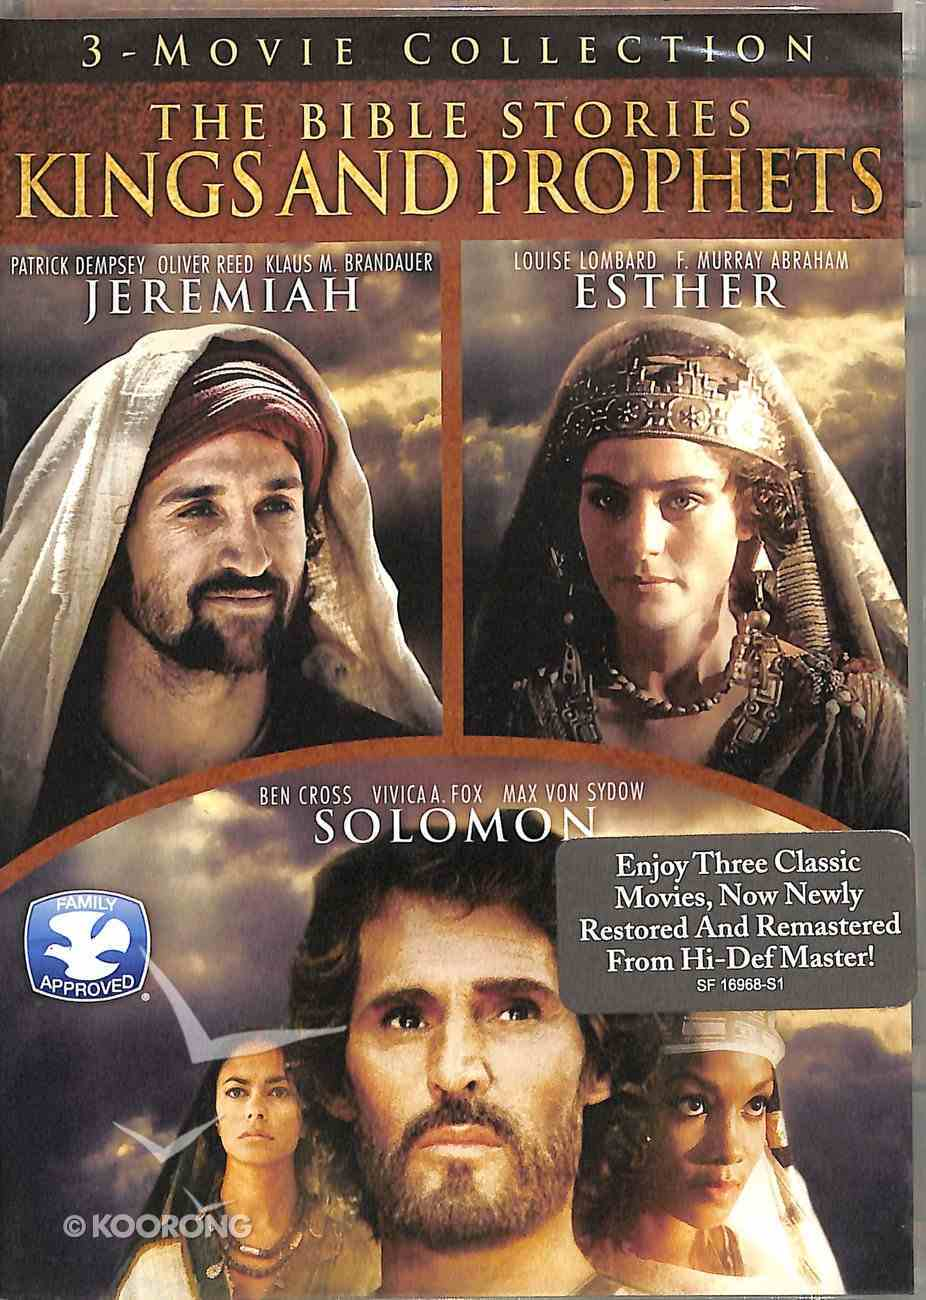 Kings & Prophets (Jeremiah, Esther, & Solomon) (Time Life Bible Stories Dvd Series) DVD